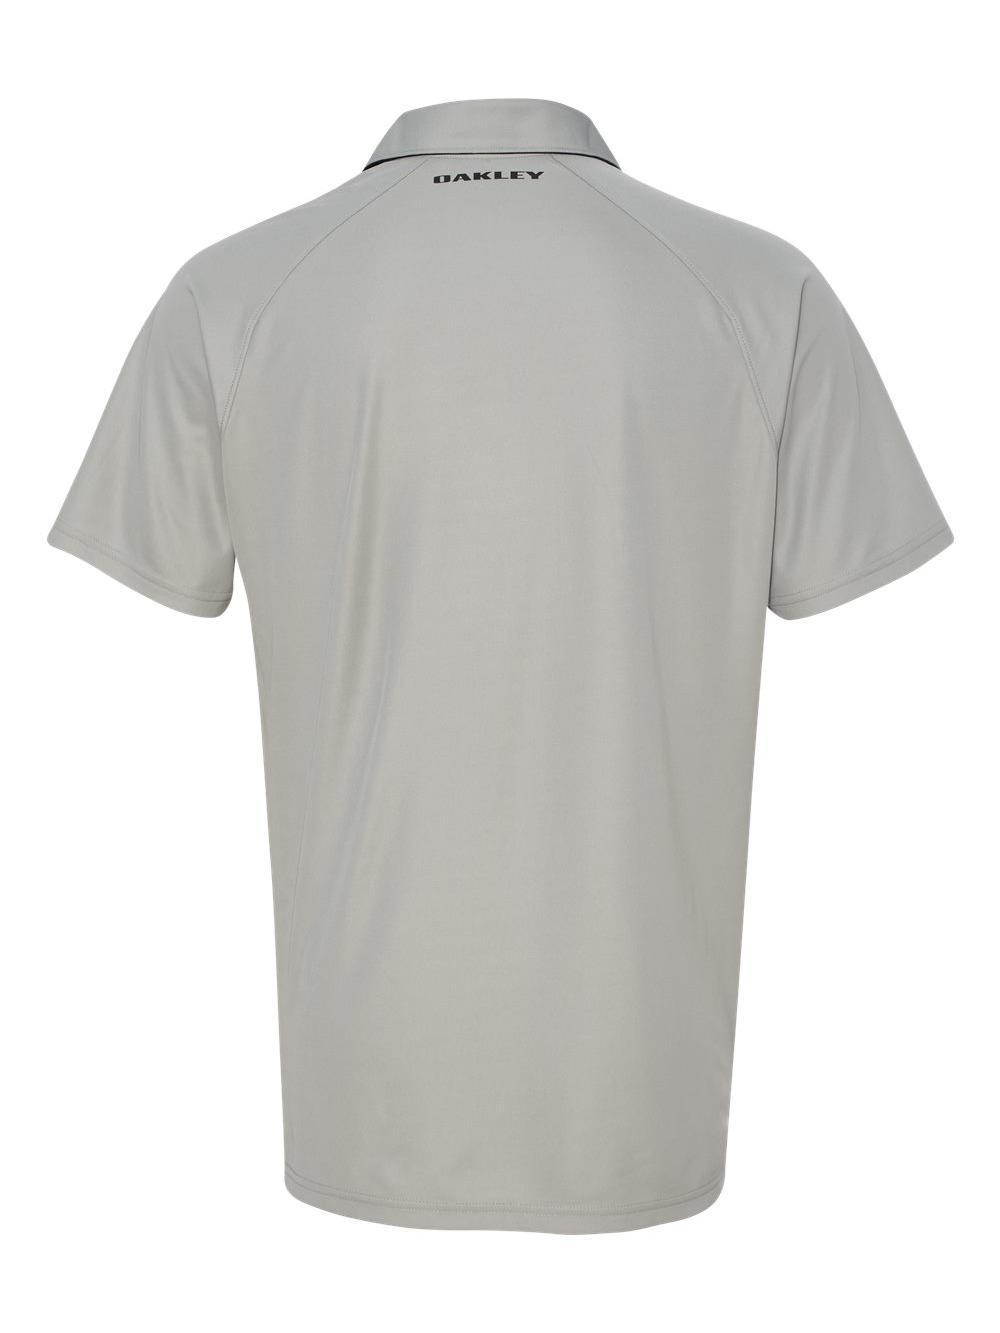 Oakley-Elemental-2-0-Sport-Shirt-432632ODM thumbnail 10